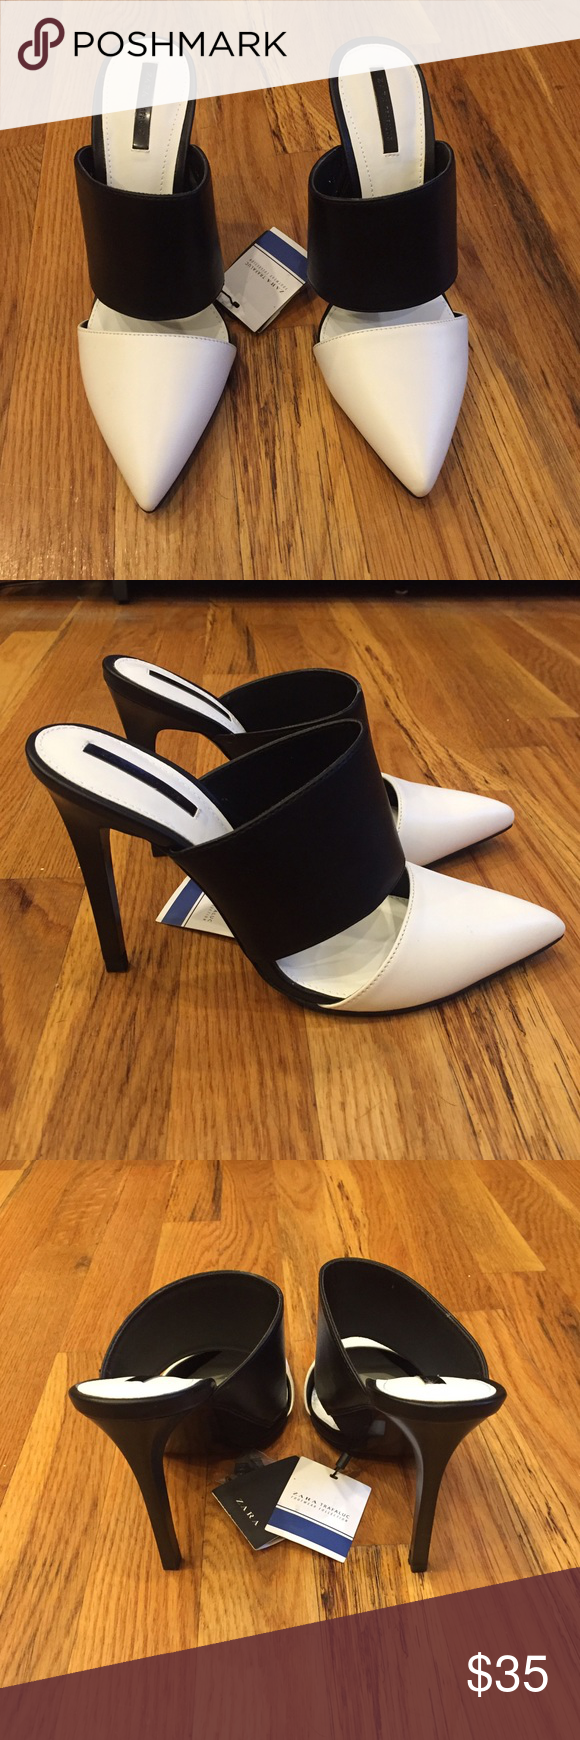 Zara Black and White Stiletto Mules New black and white Mules from Zara  with a stiletto - Black And White Mule PNG